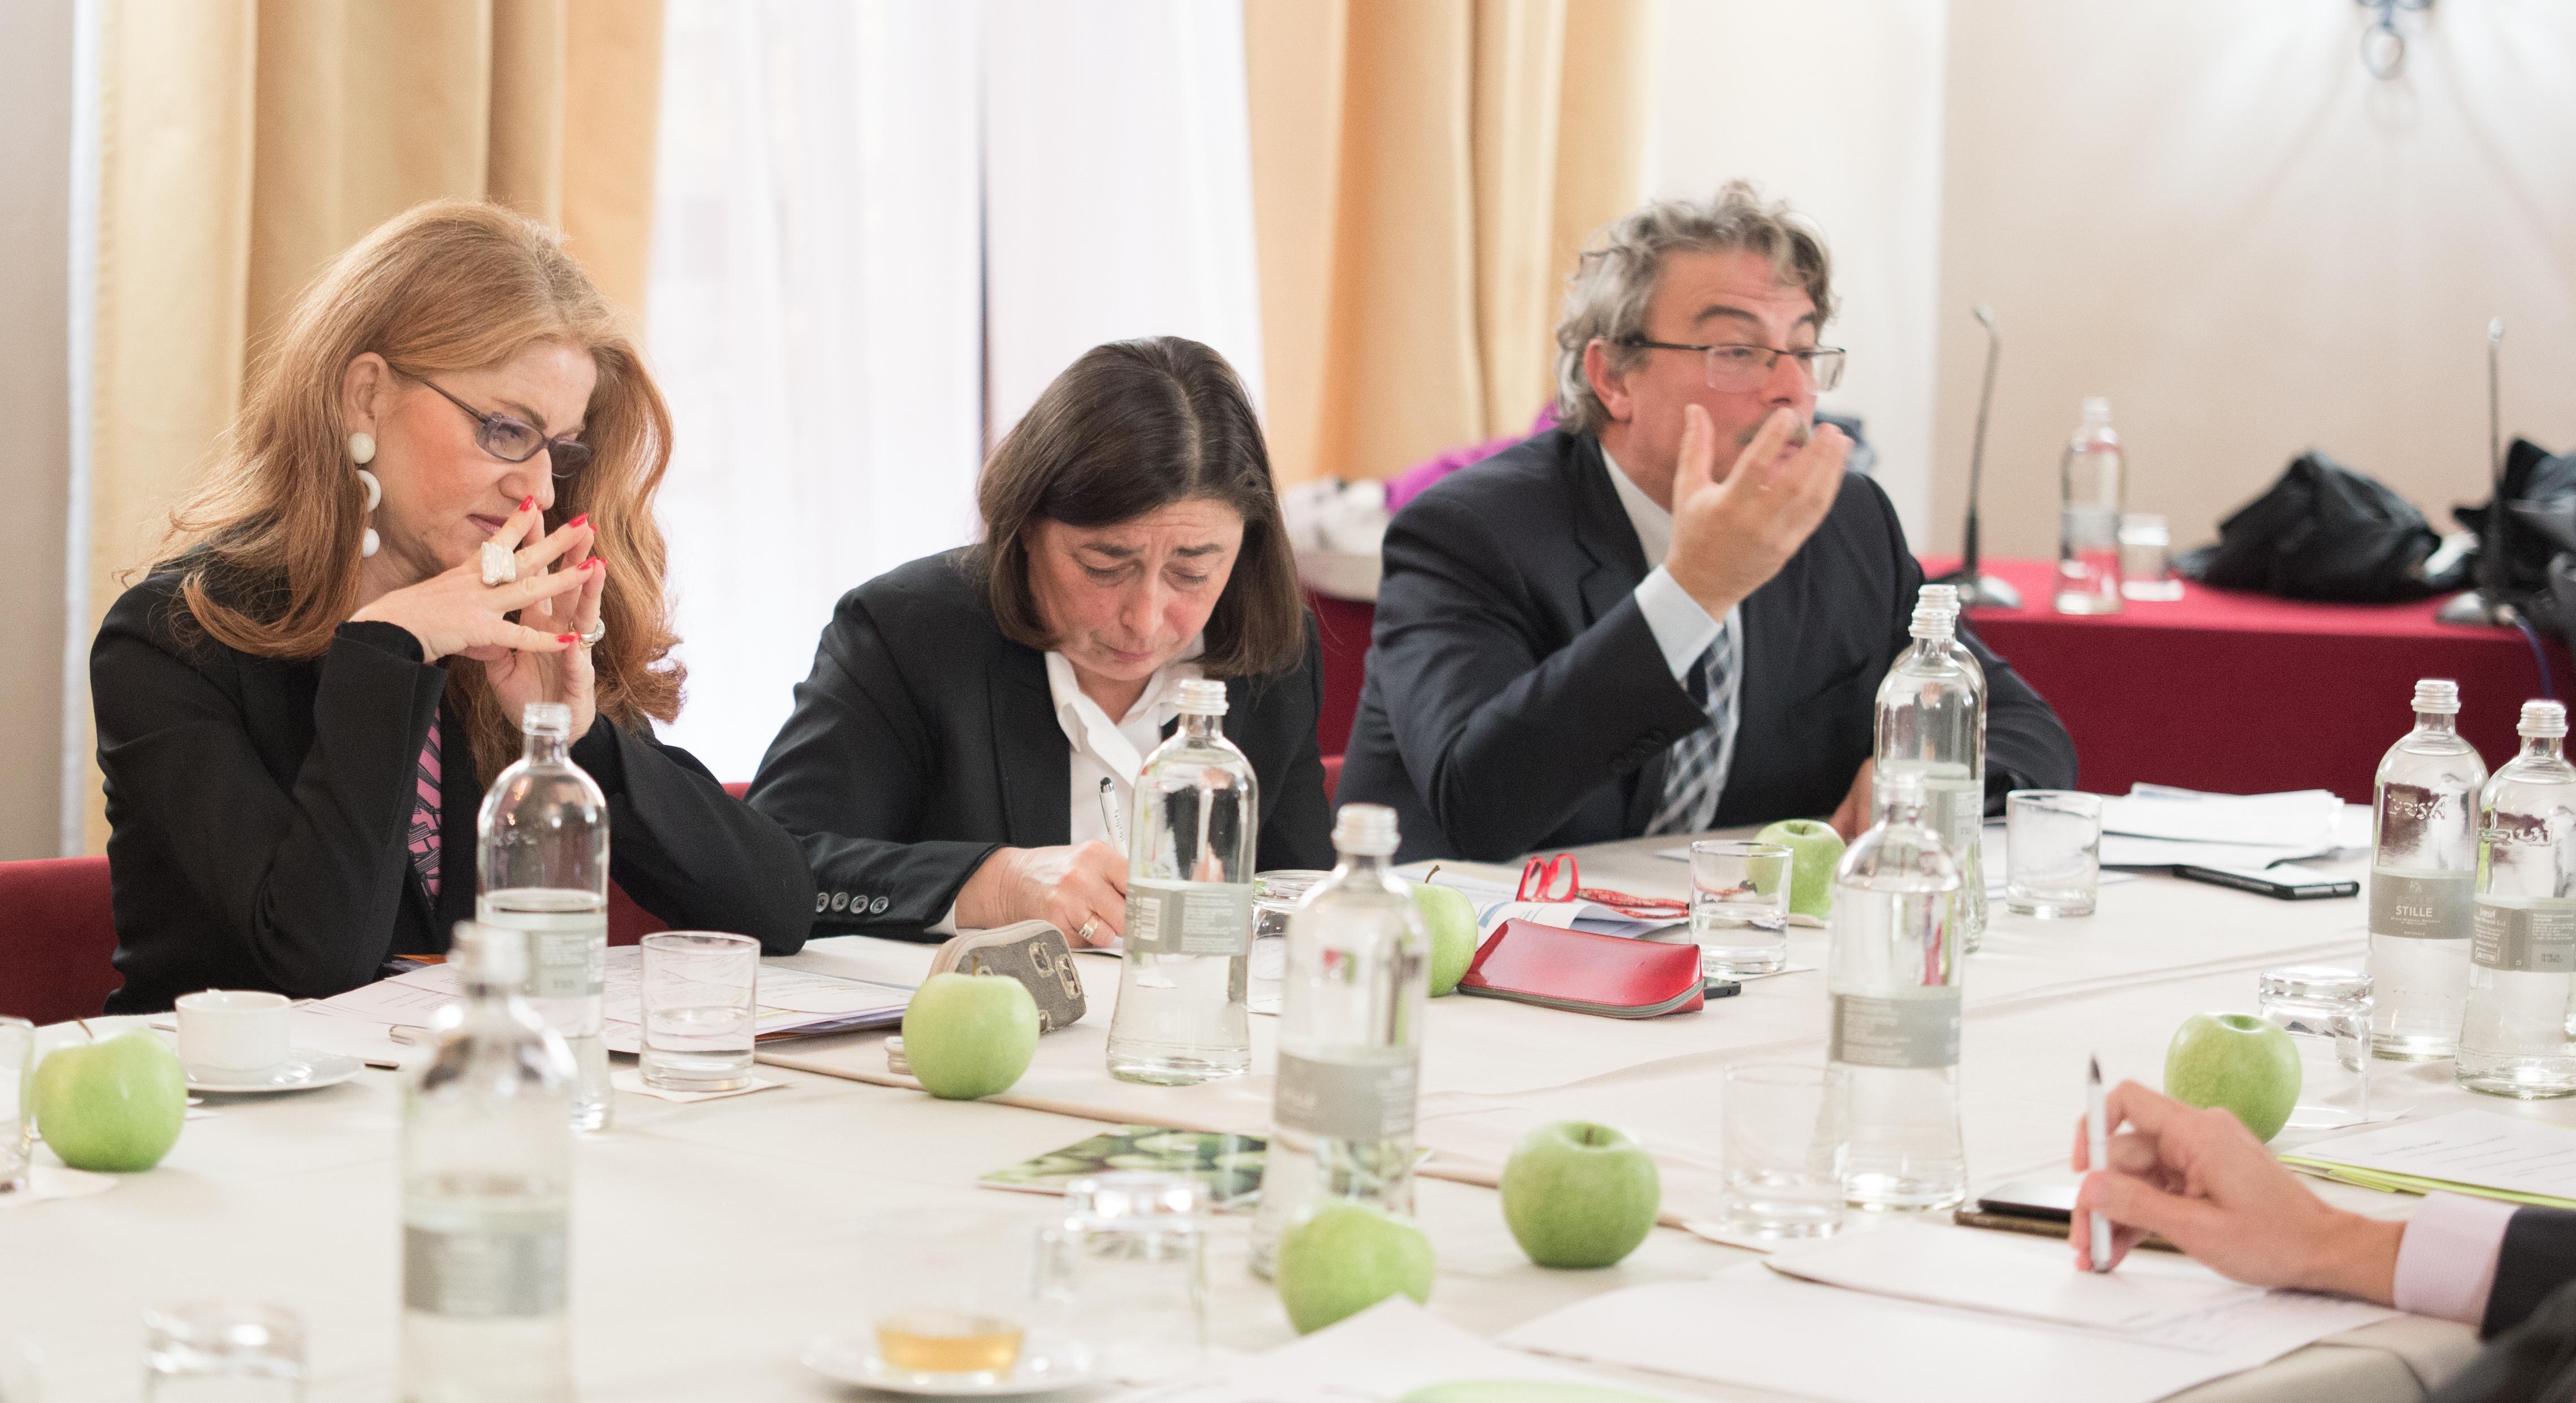 Da destra: Guerrieri (Omi), Coletti (Banca Intesa), Rubertelli (Notariato)